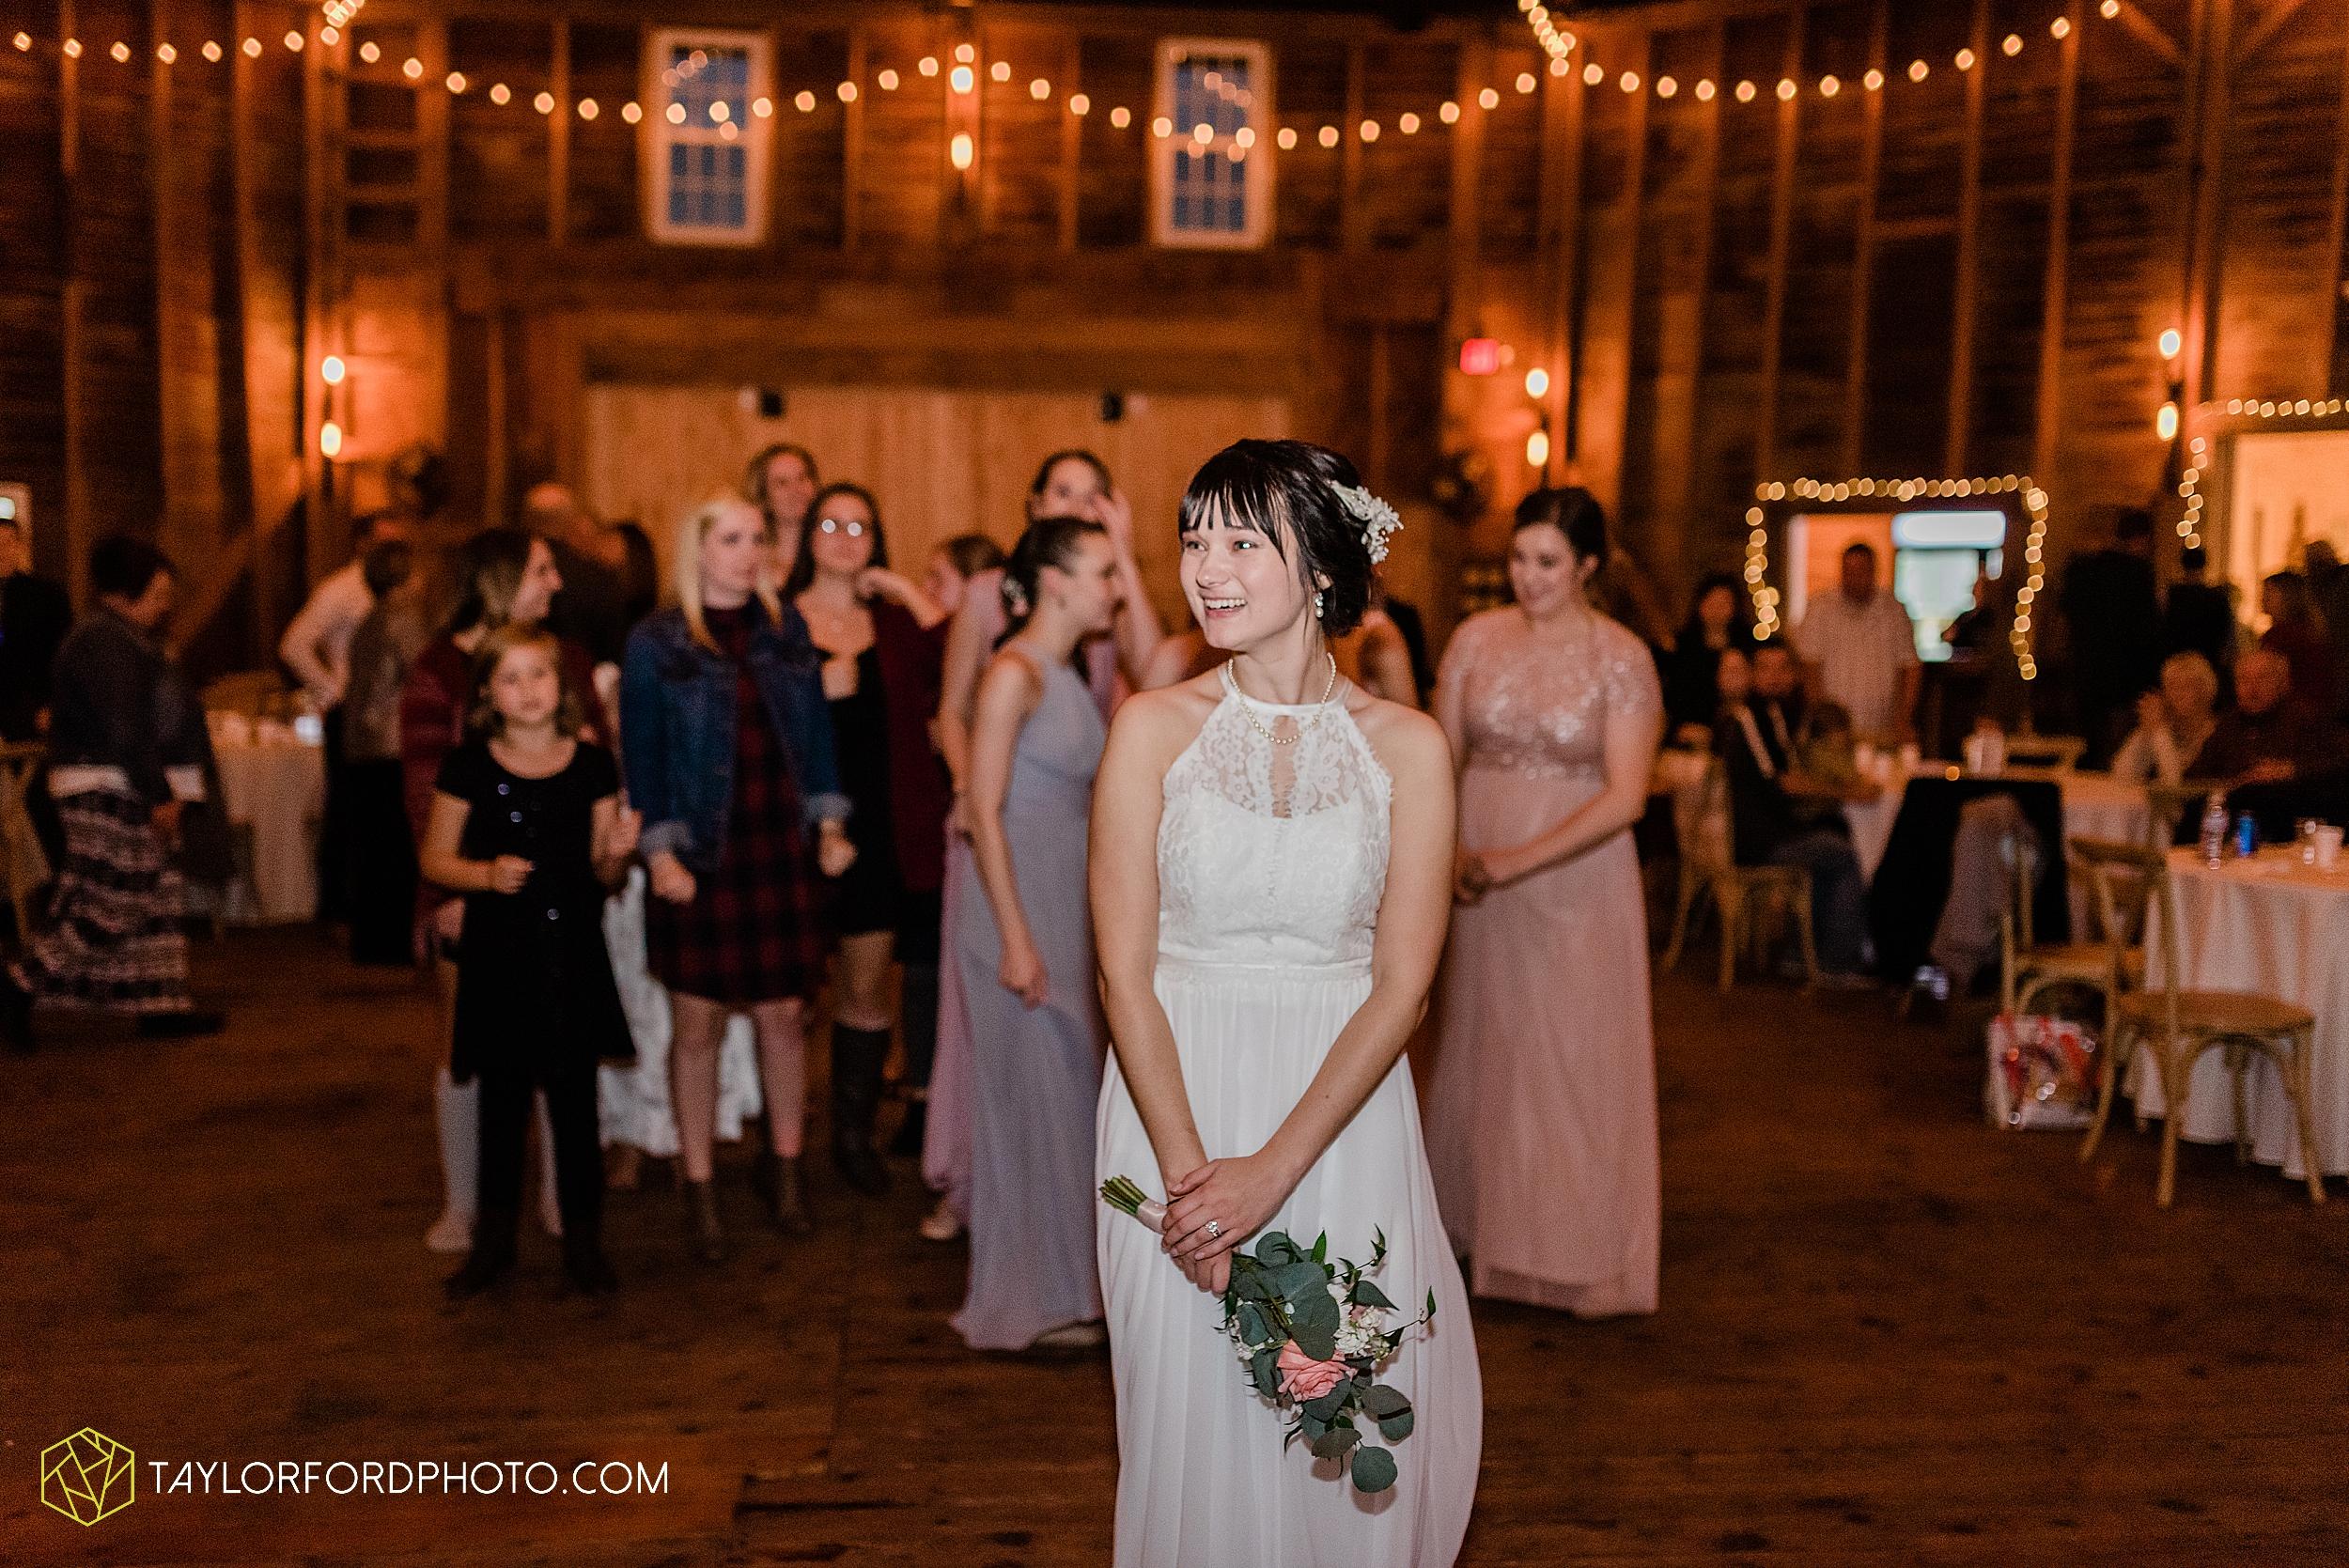 marissa-nicole-nick-daeger-orrmont-estate-farm-wedding-piqua-dayton-troy-ohio-fall-photographer-taylor-ford-photography_1565.jpg